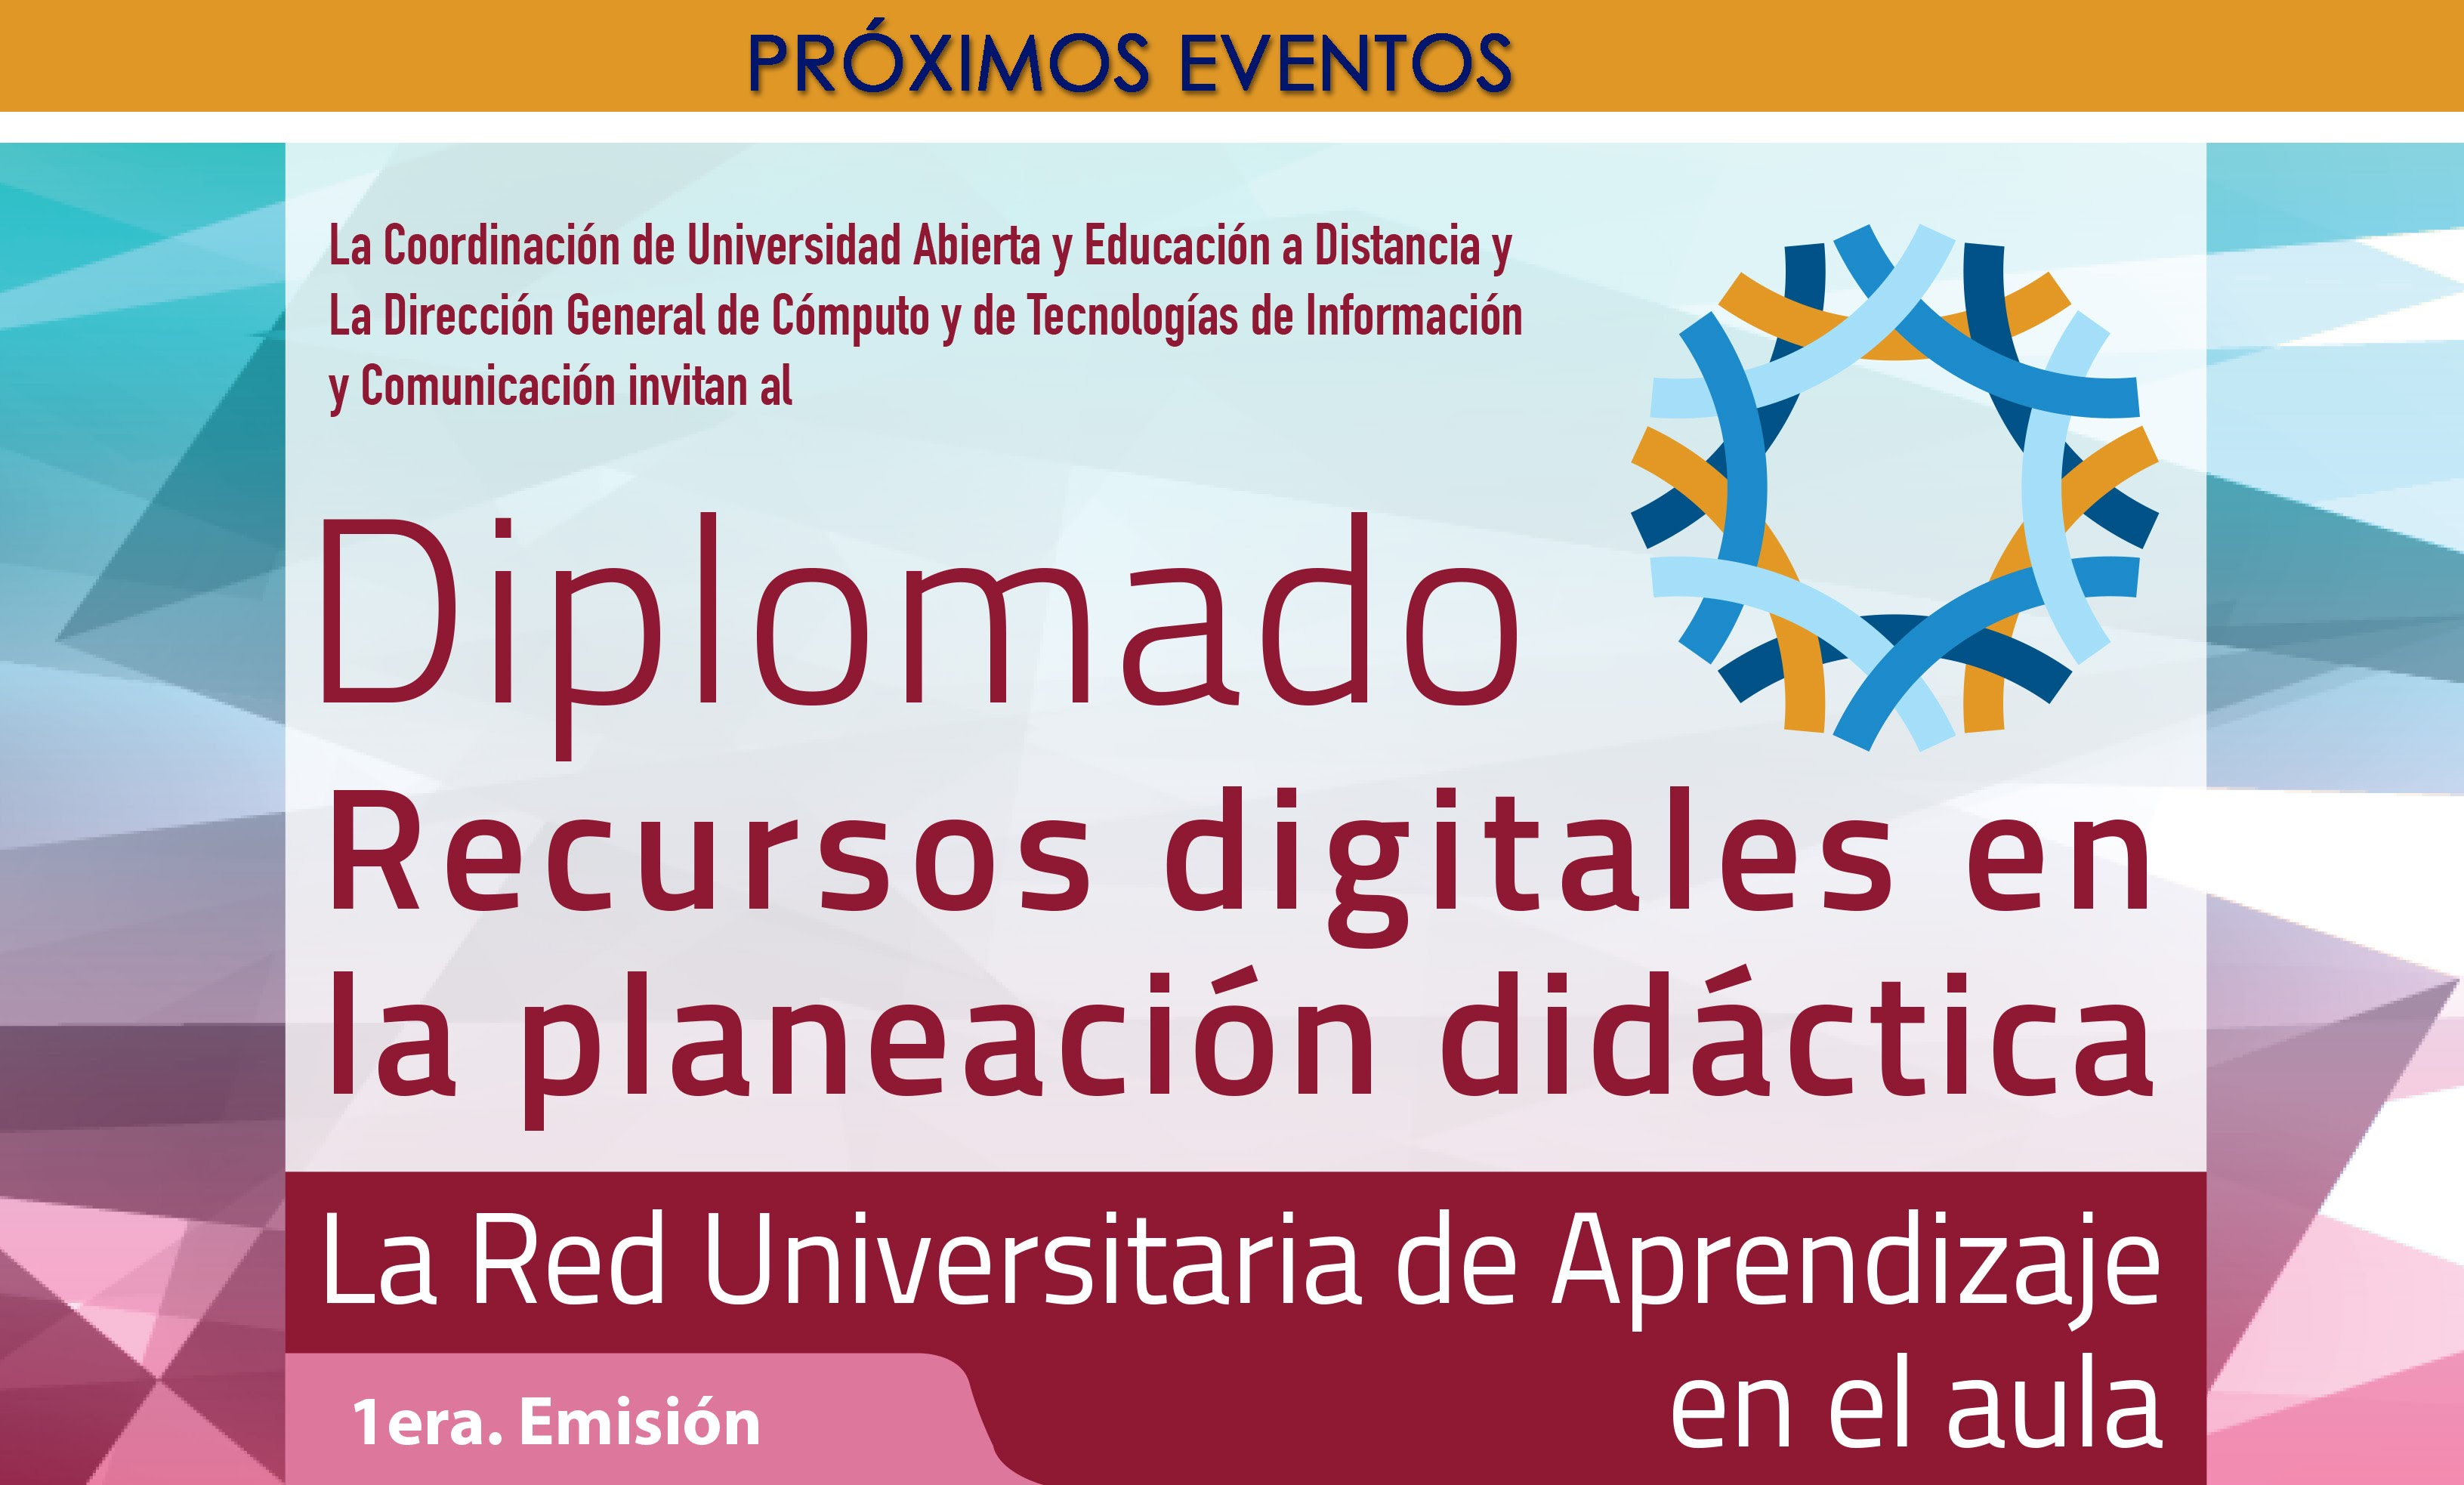 https://educatic.unam.mx/formacion-docente/diplomados/rua/emision-1-enp.html